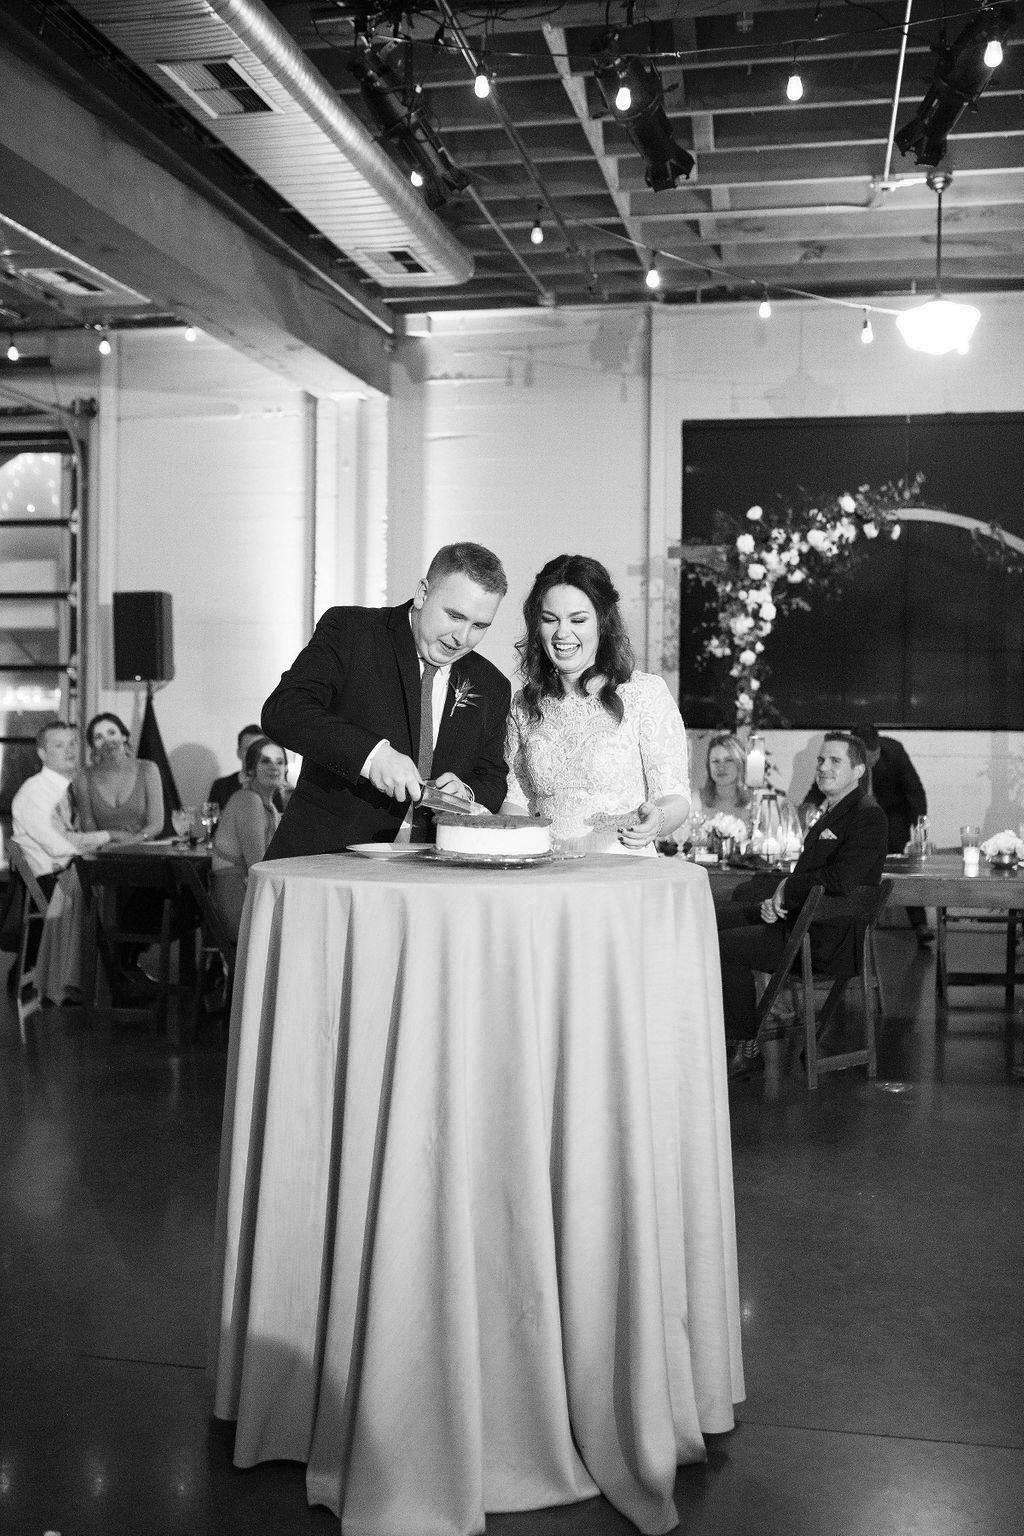 044_reception_portland,oregon,castaway,wedding,by_outlive_creative,photo,and,video.jpg